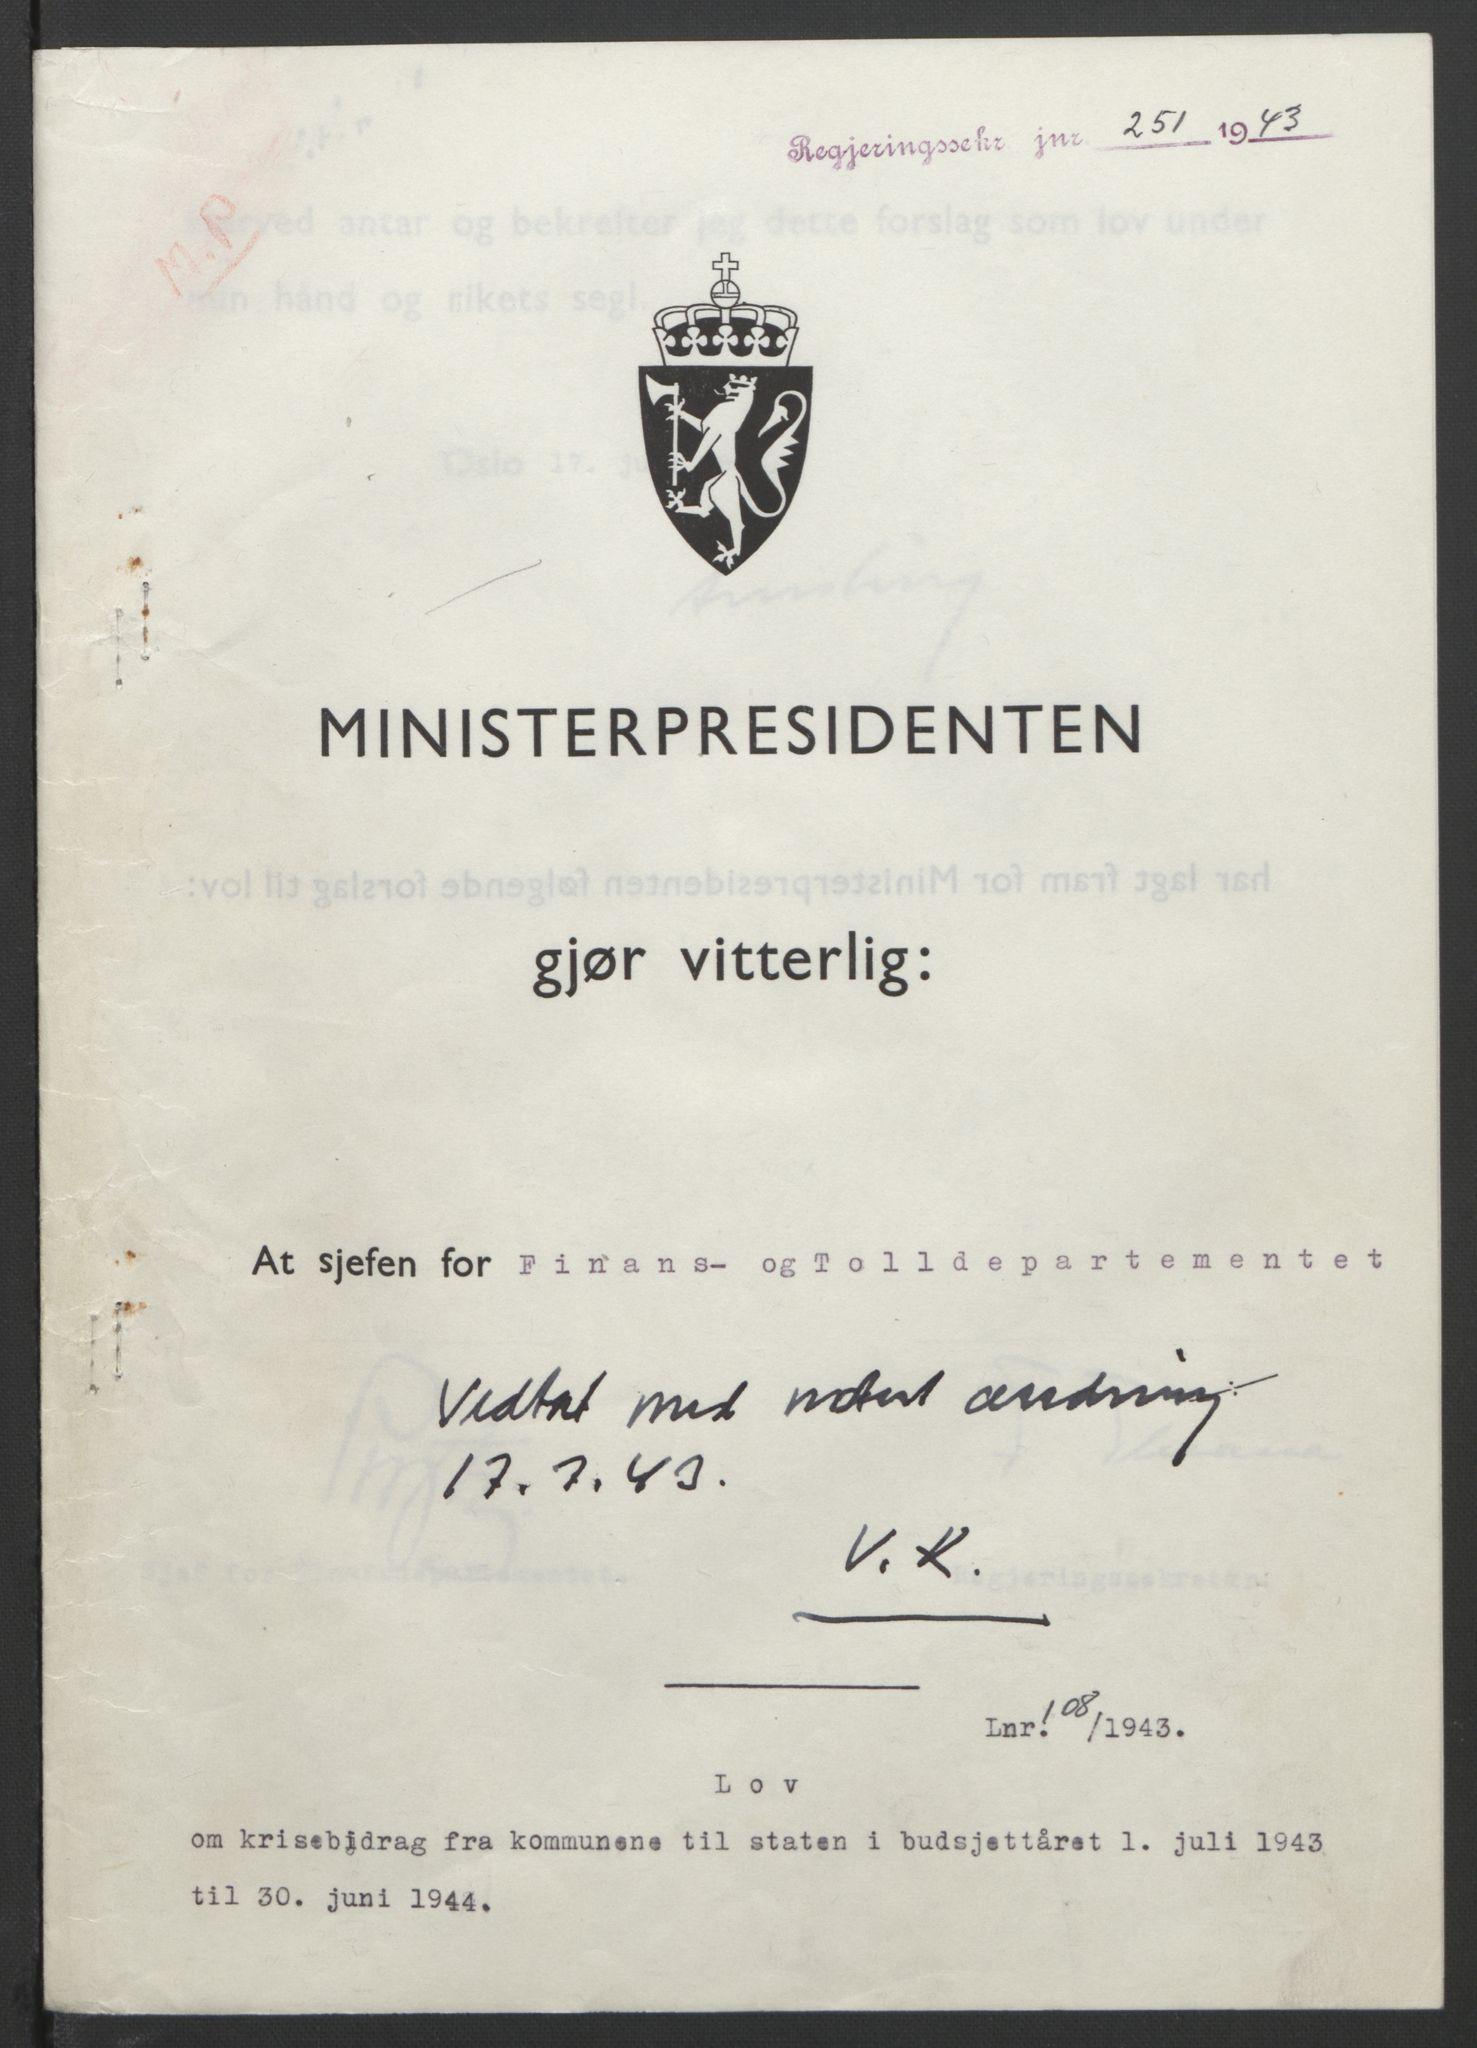 RA, NS-administrasjonen 1940-1945 (Statsrådsekretariatet, de kommisariske statsråder mm), D/Db/L0099: Lover, 1943, s. 503